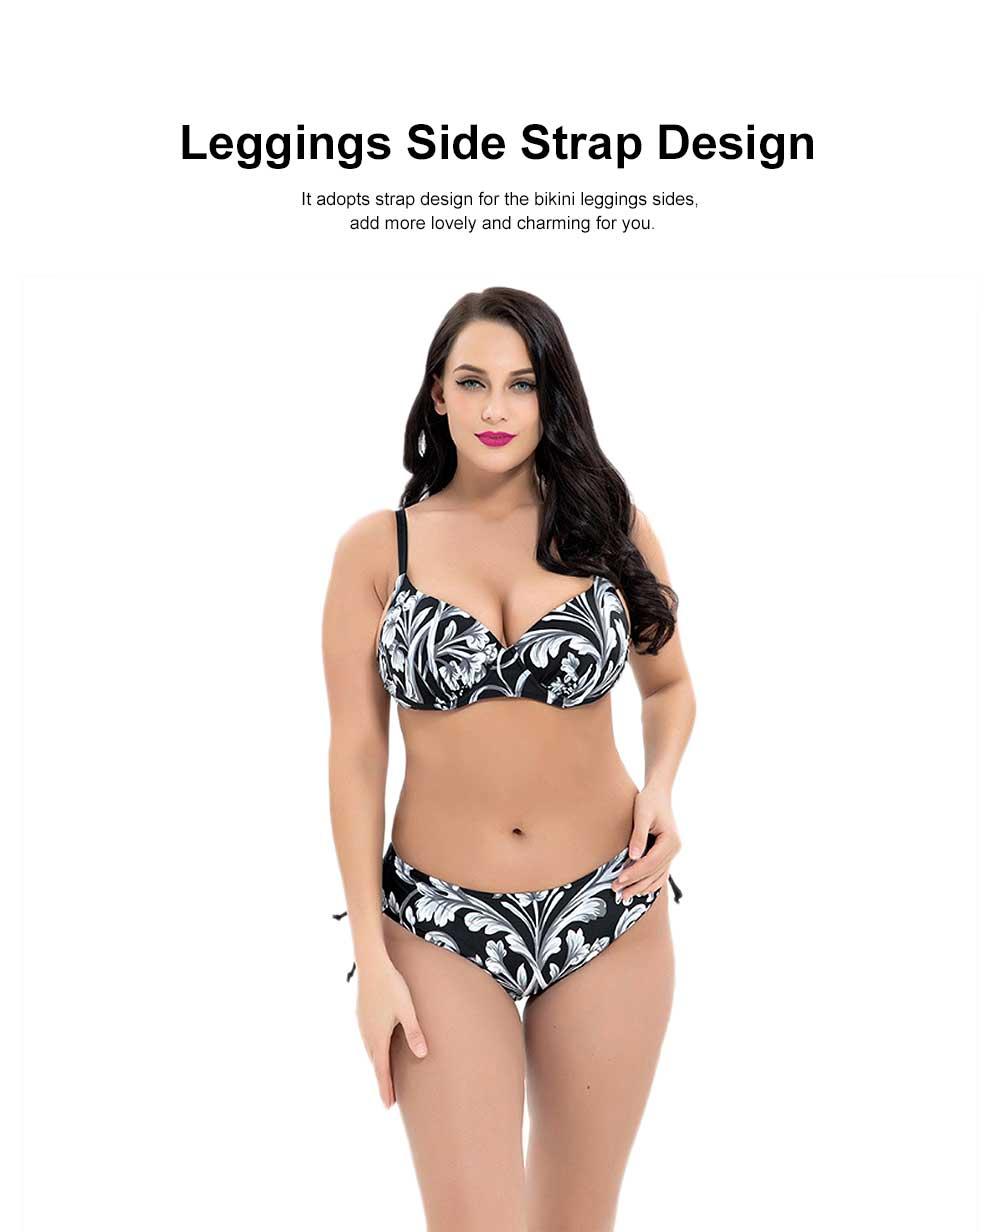 Women's Large Size Sexy Swimming Suits, Two-Piece Plus Size Beachwear, Fashion Printing Bathing Suits 4XL 5XL 6XL 7XL 8XL 1